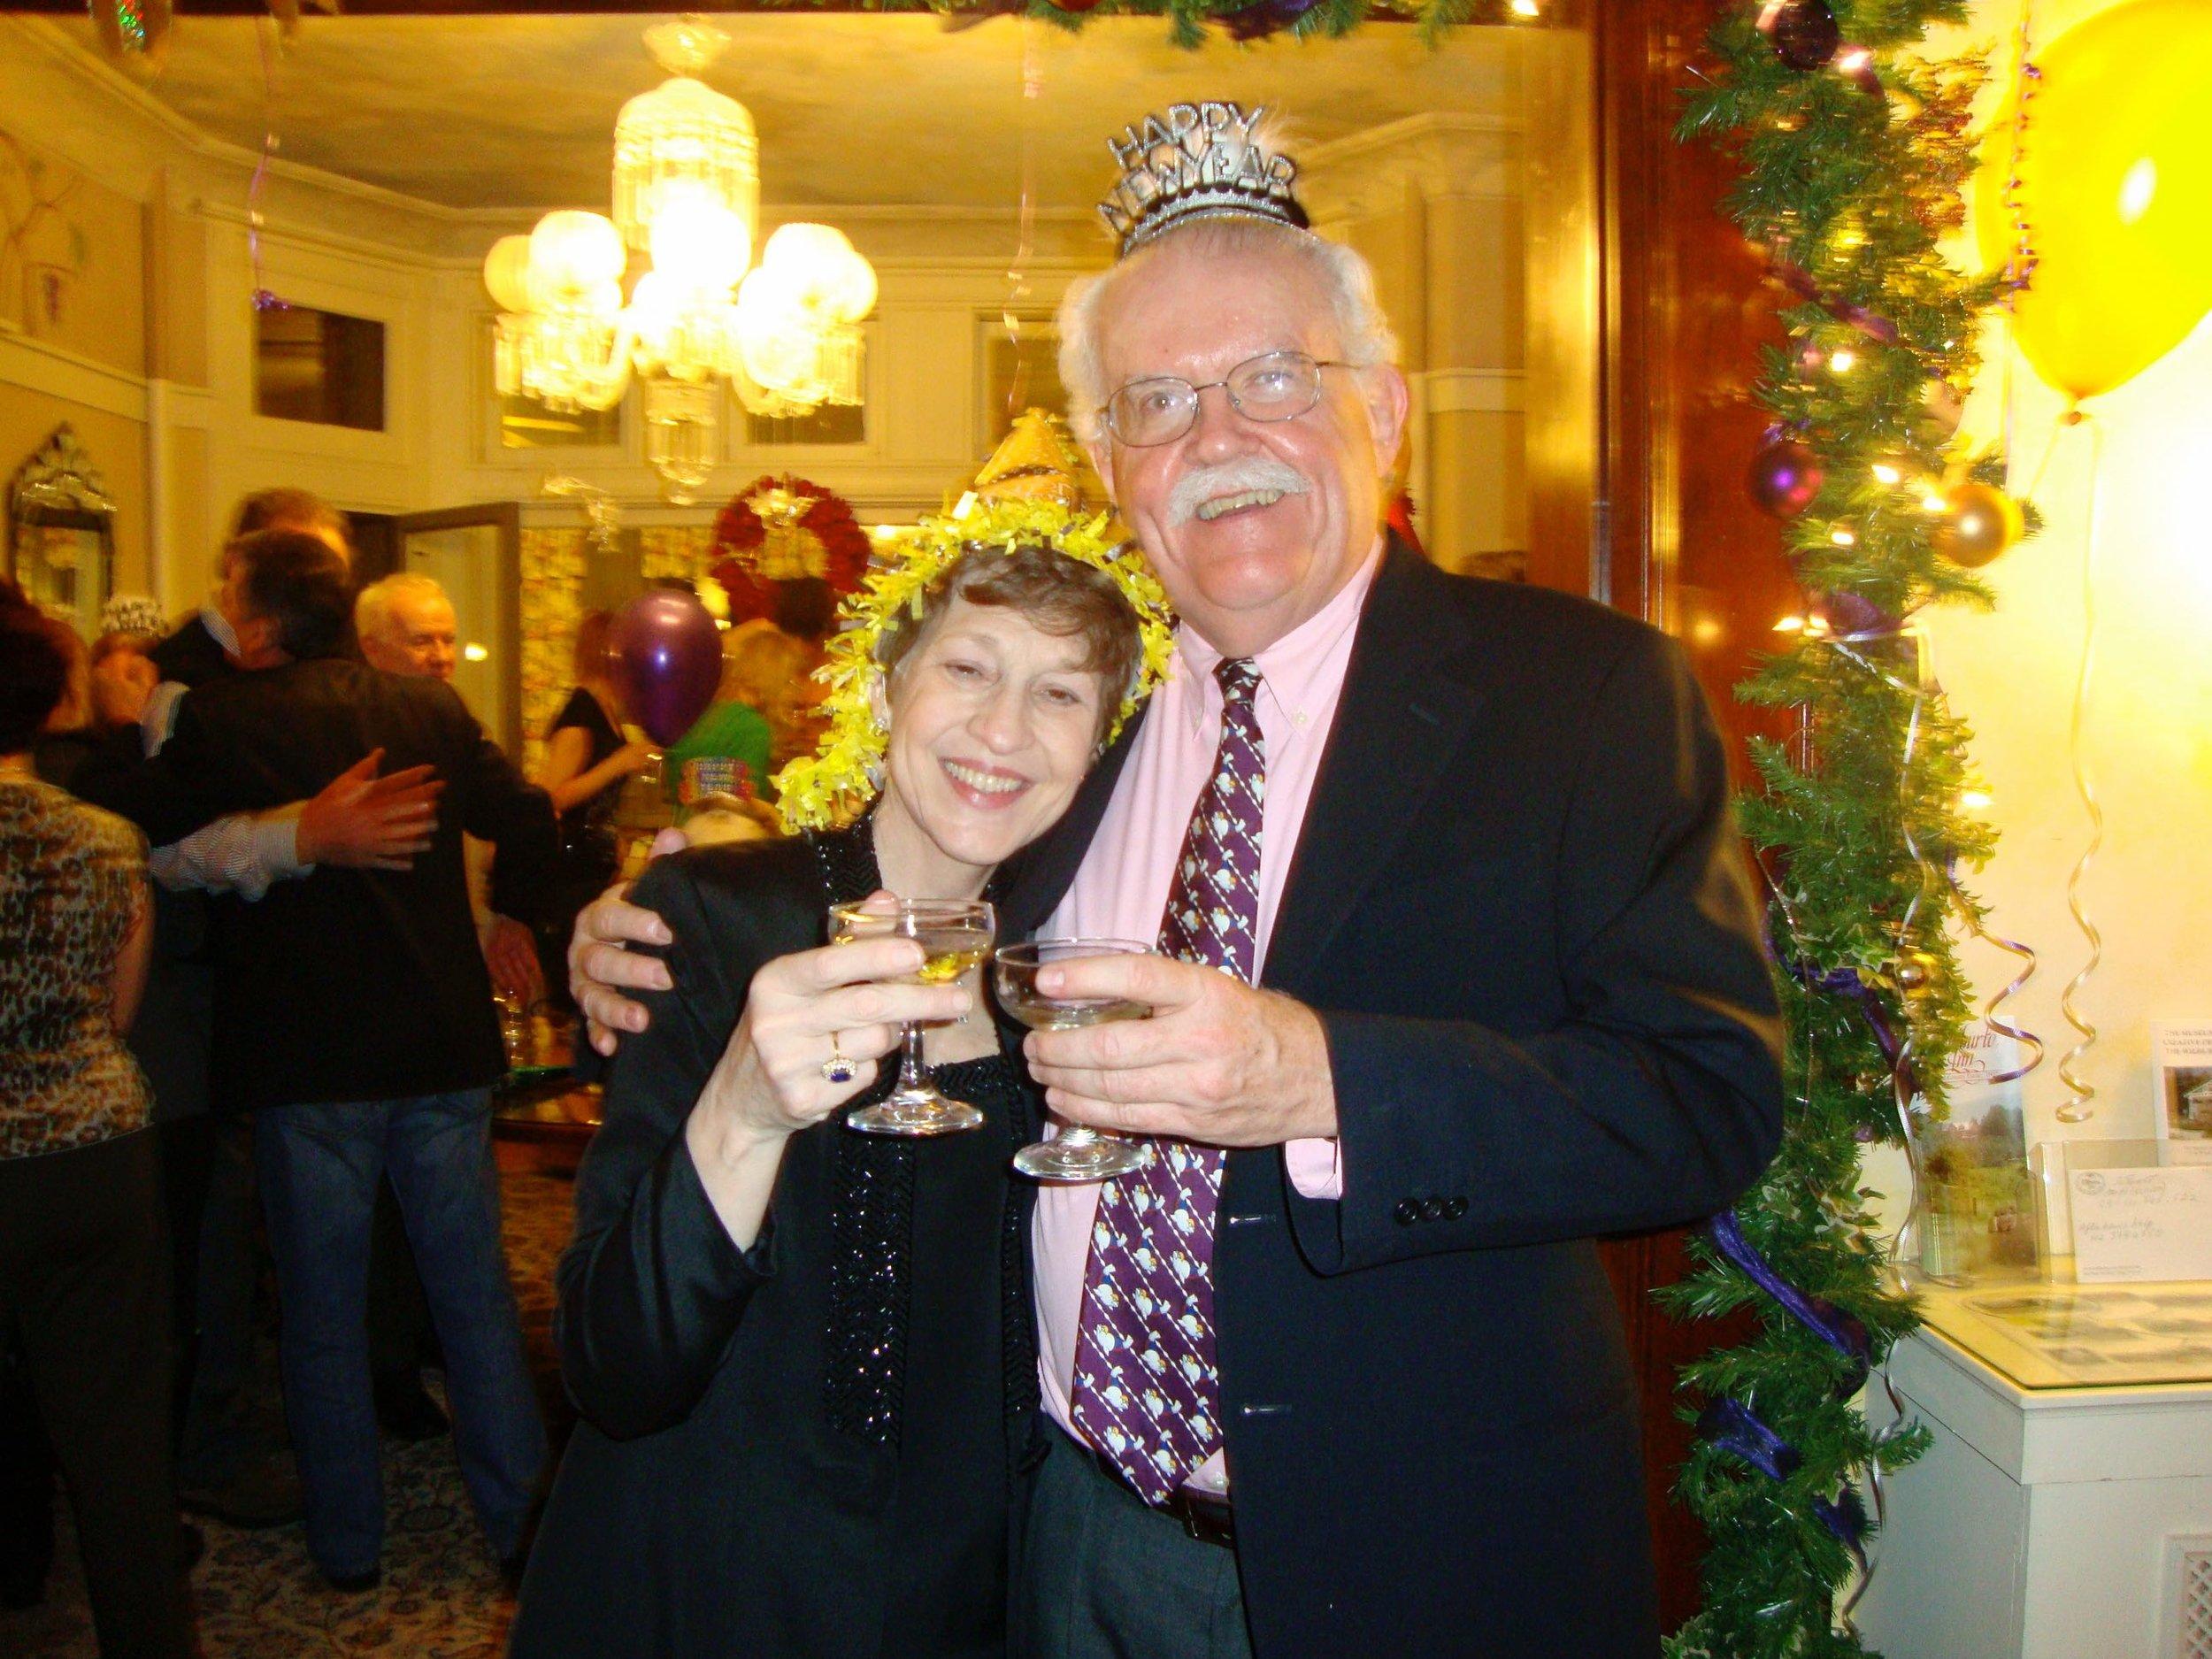 New Years Champaign Toast Seabrooks.jpg